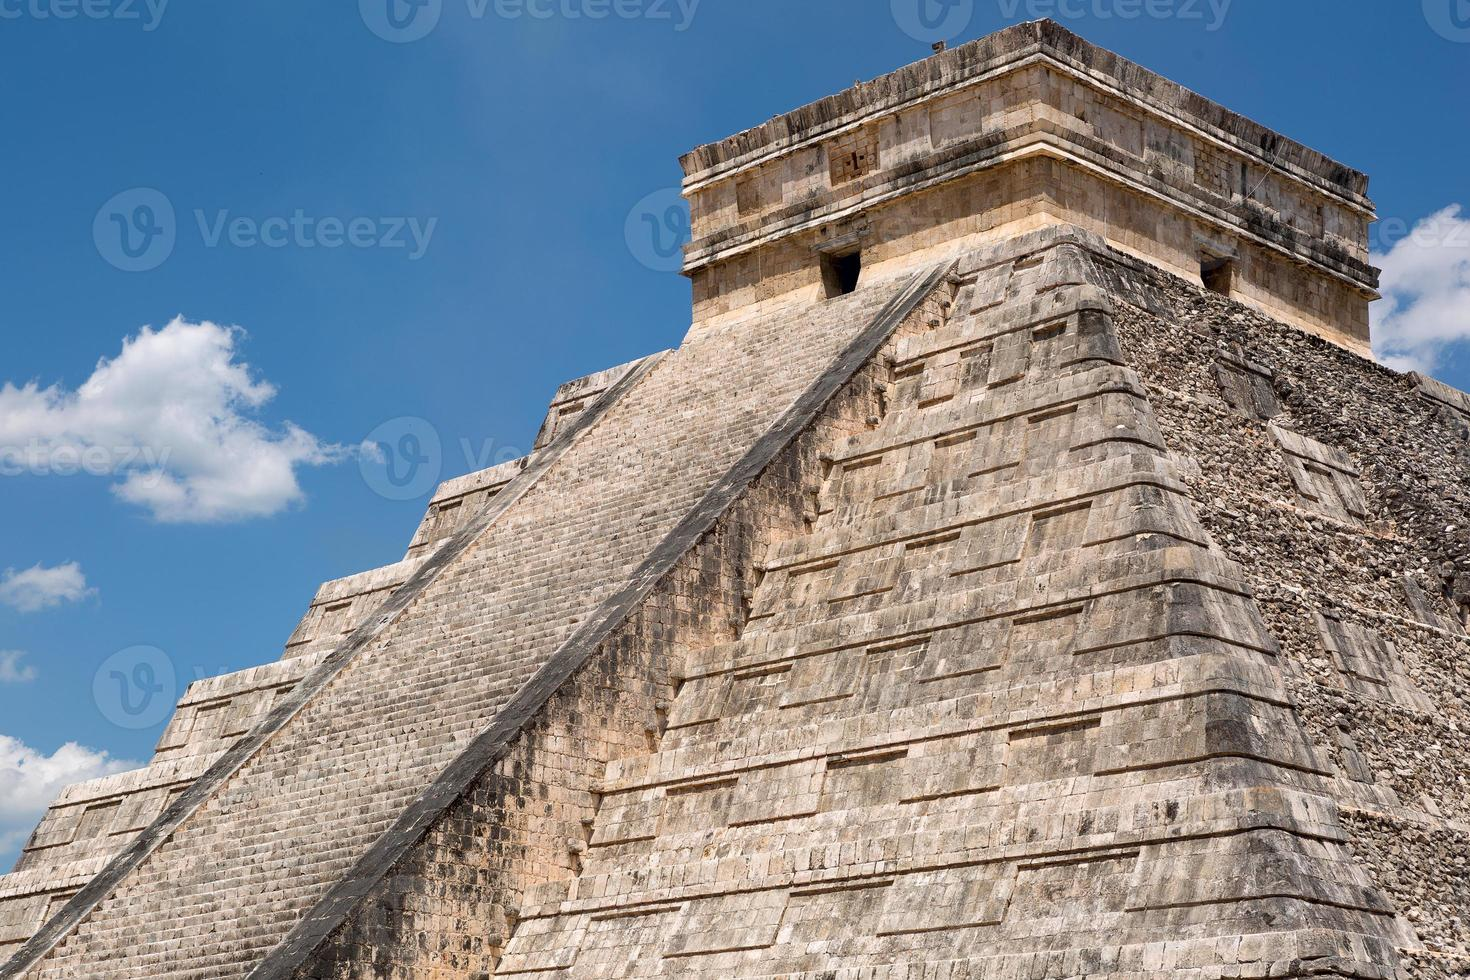 kukulcan piramide close-up foto